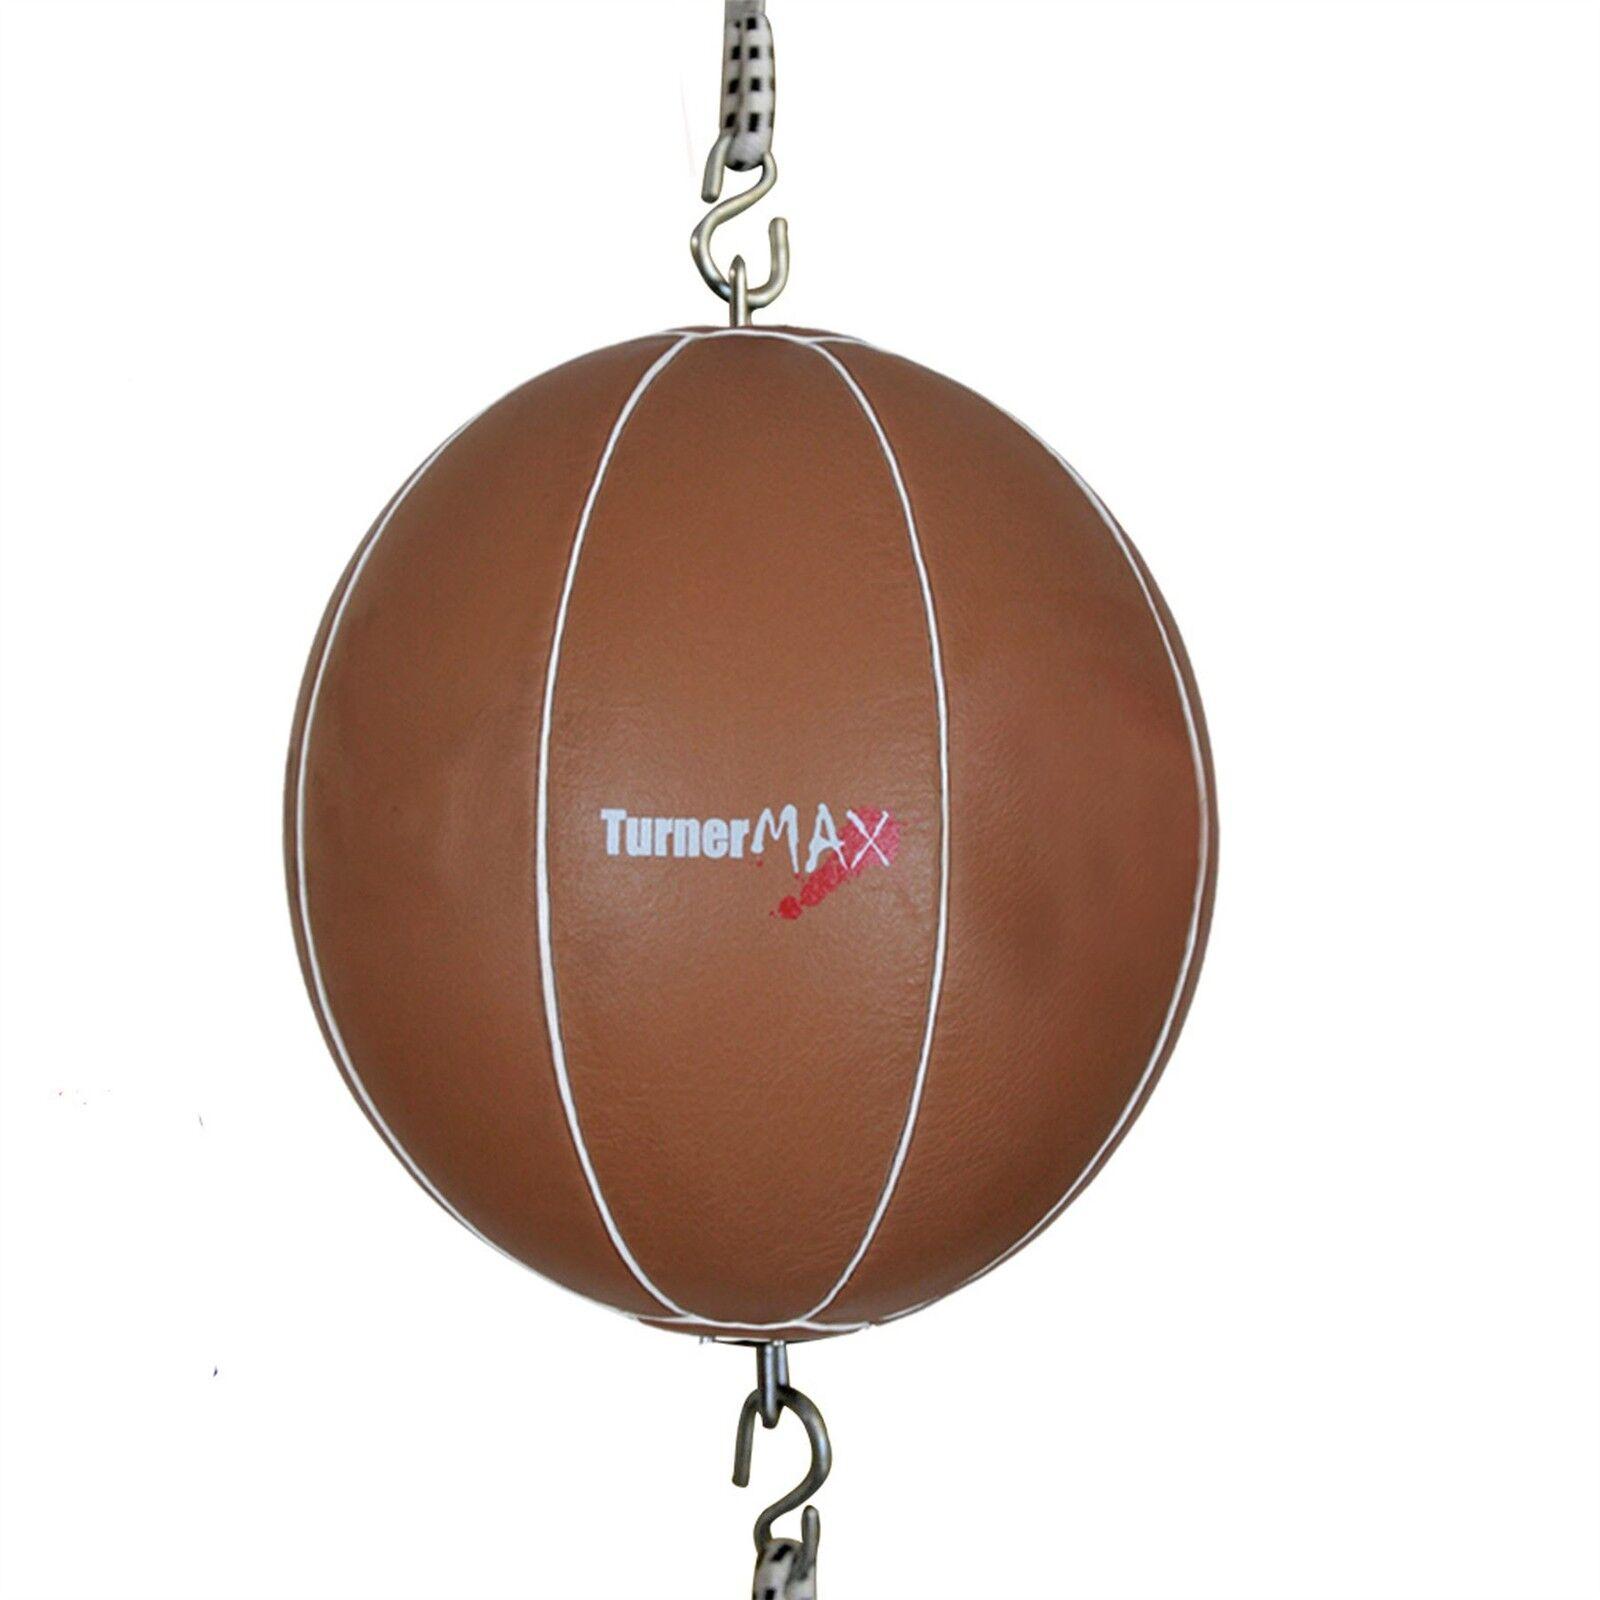 TurnerMAX Leder Trainings Dball Speed Ball Ball Ball Doppel End MMA Training Exercise  | Sehr gelobt und vom Publikum der Verbraucher geschätzt  48b565